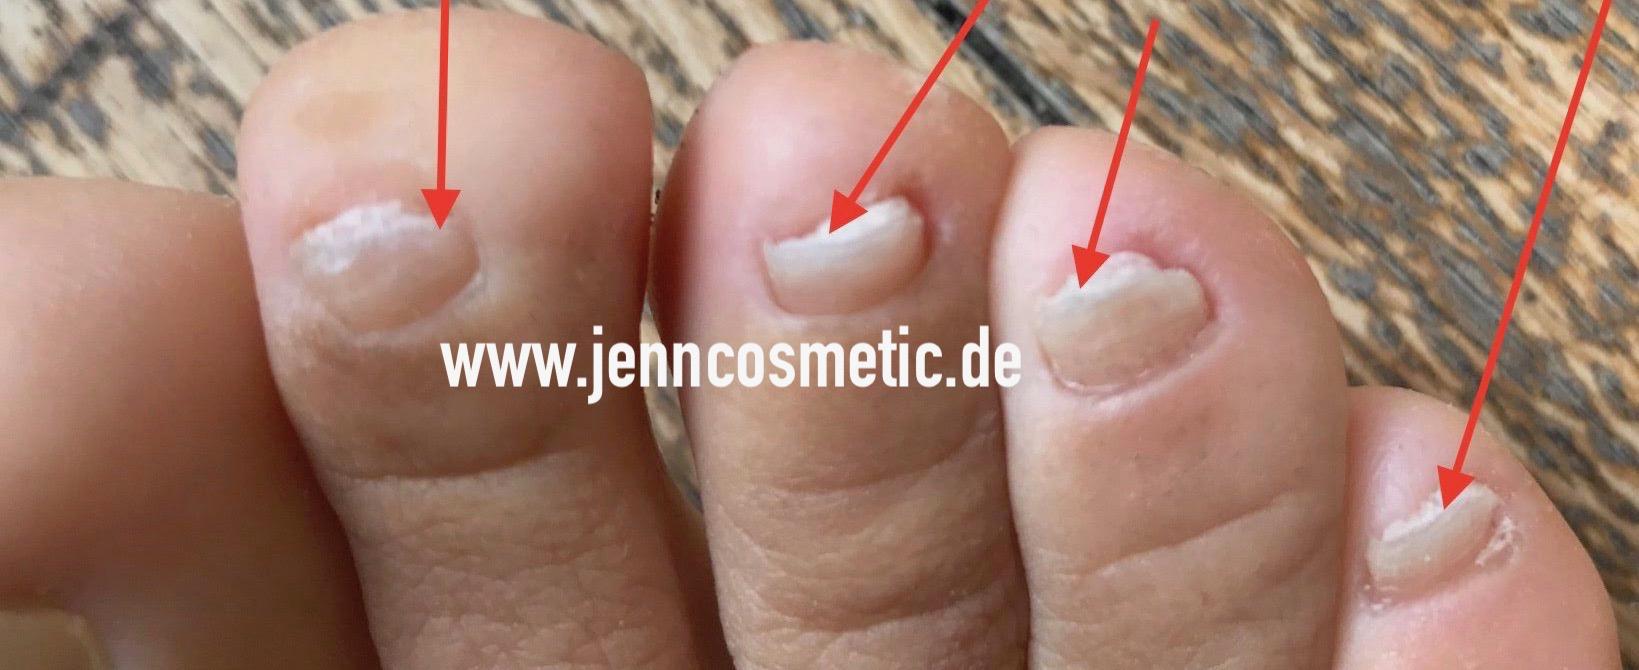 fußnagel-krankheiten-bilder-jenncosmetic-8